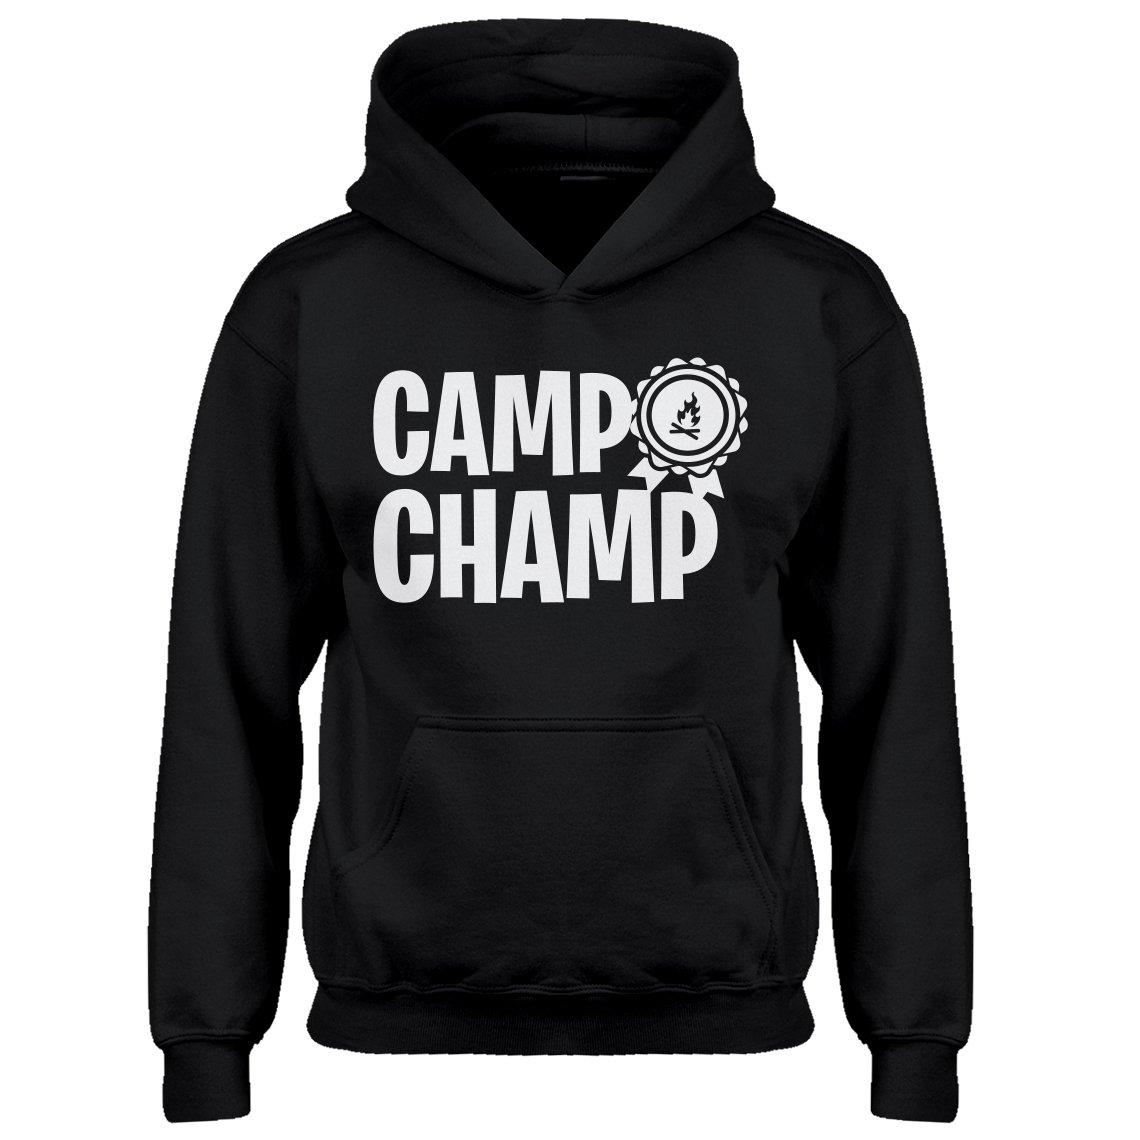 Indica Plateau Youth Camp Champ Kids Hoodie